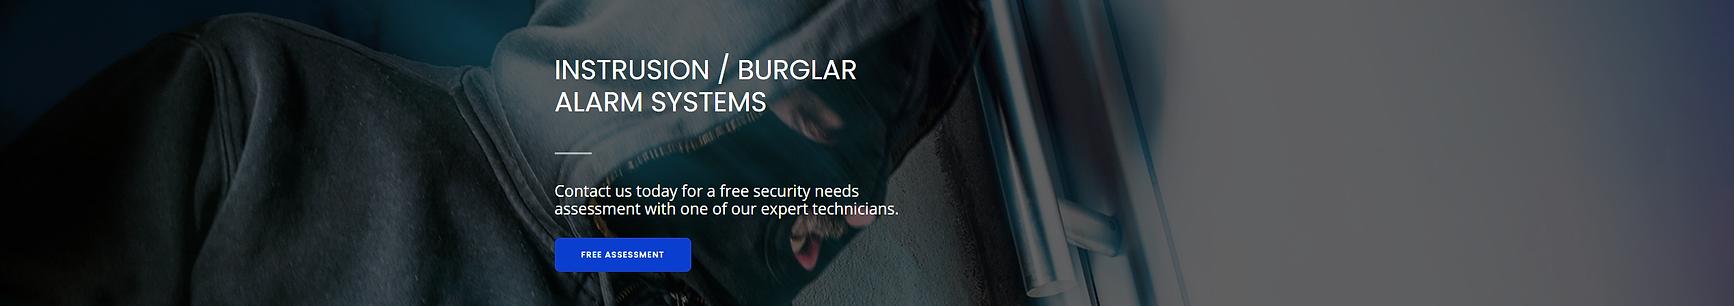 burglar banner.png